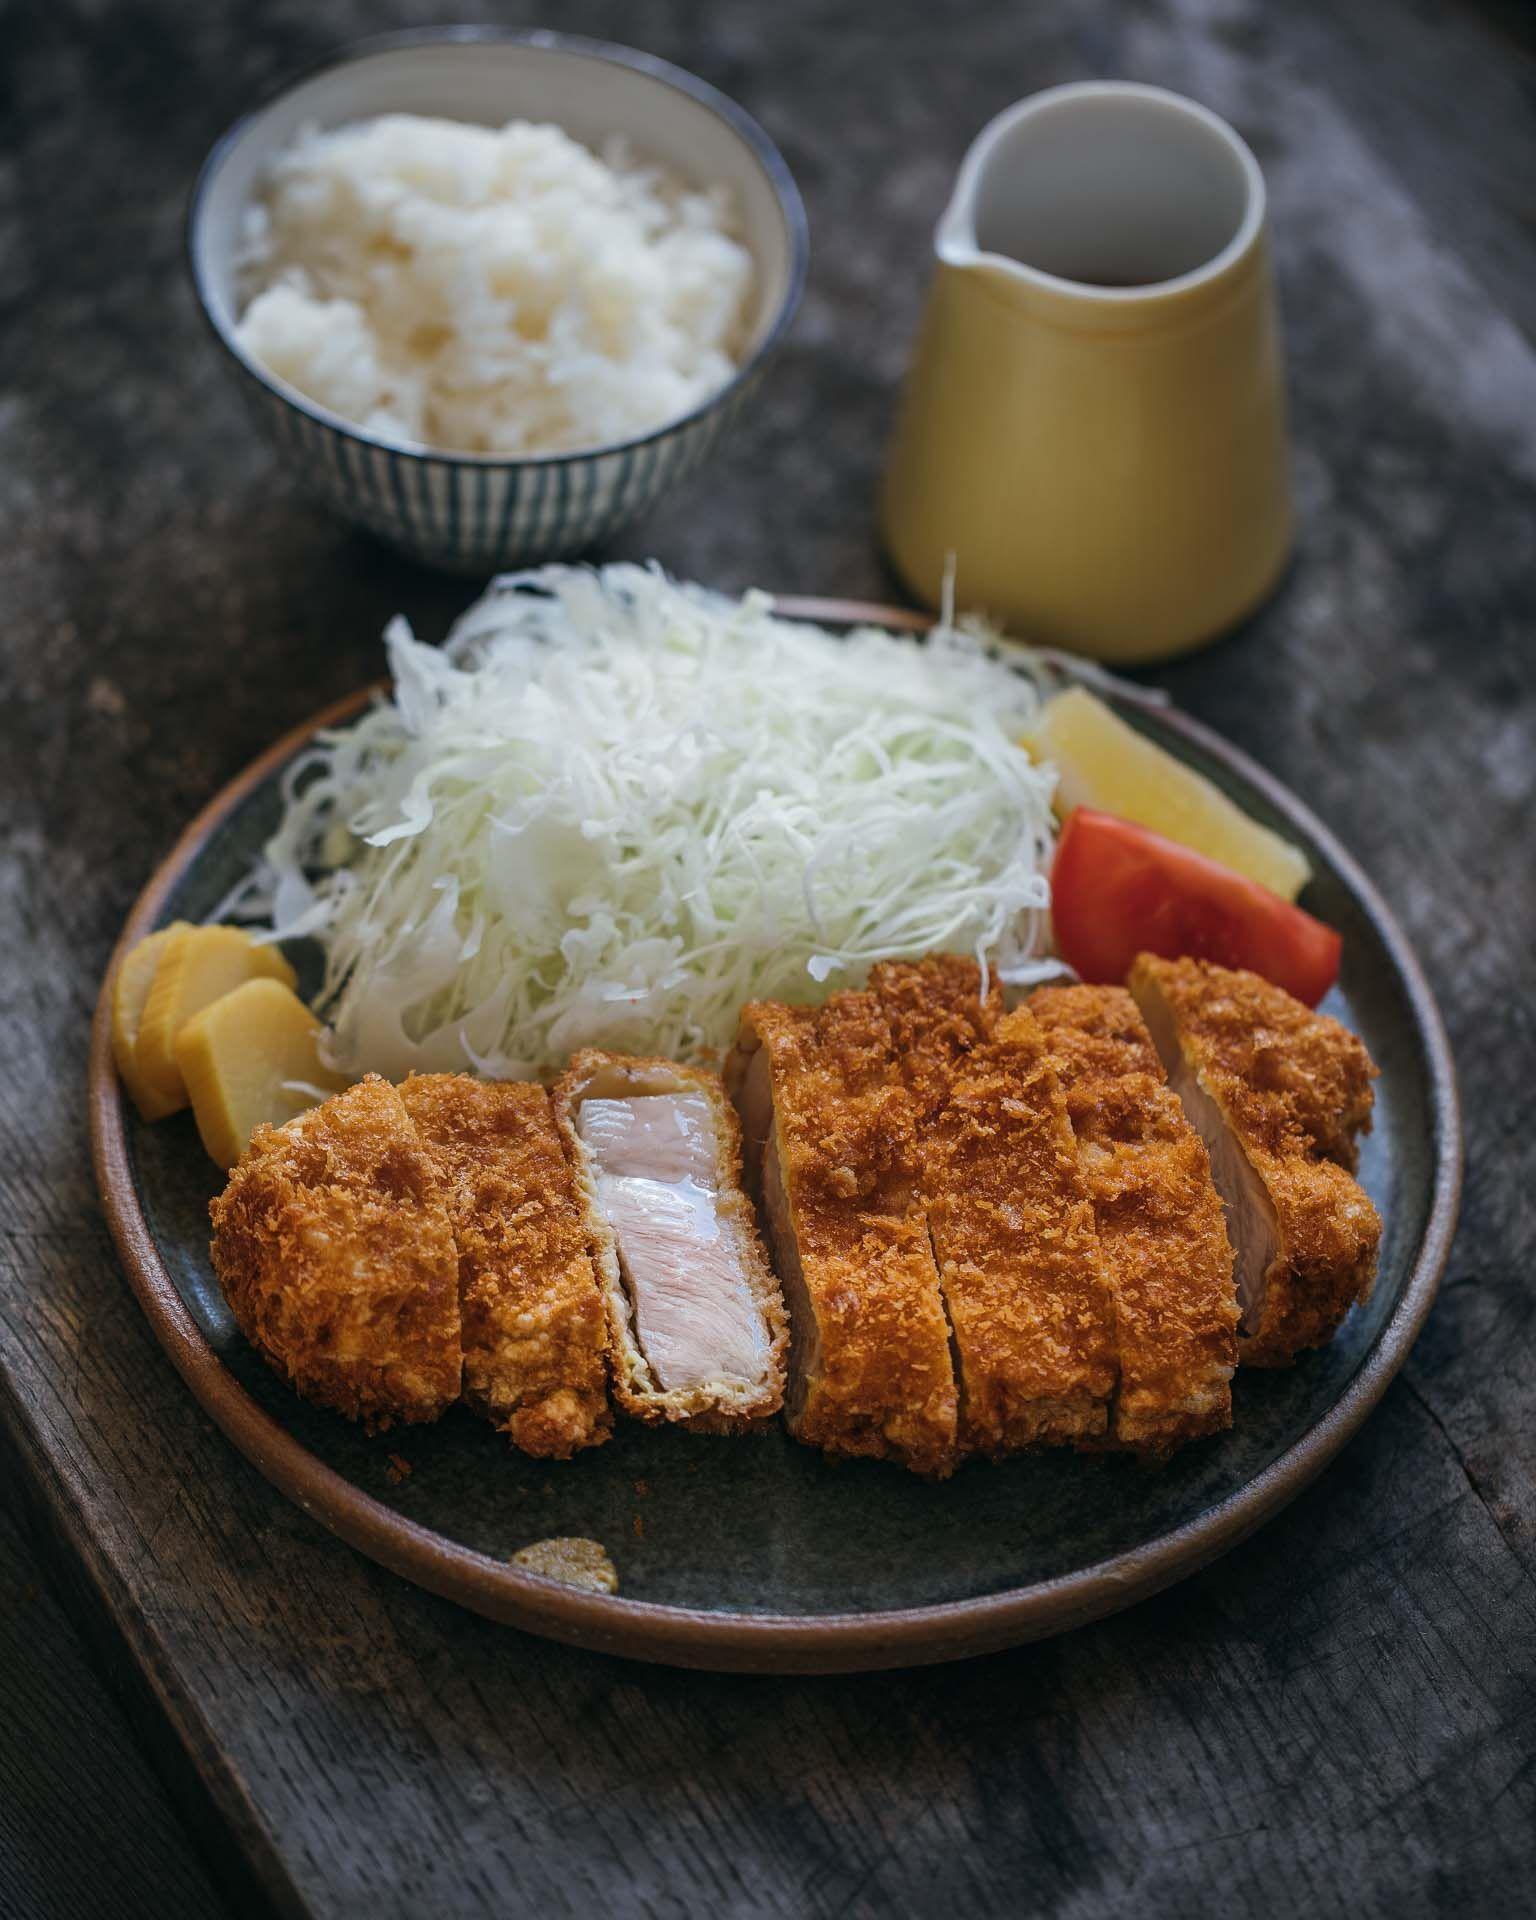 How To Make Tonkatsu Adamliaw Com In 2020 Pork Cutlets Tonkatsu Recipes